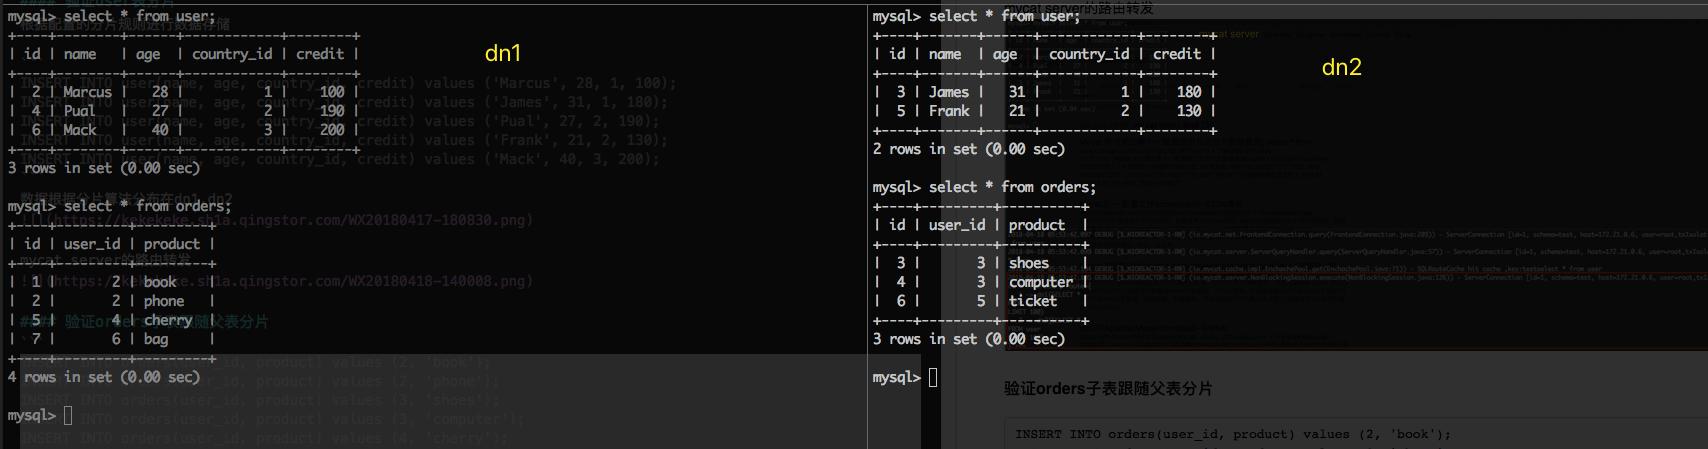 GitHub - aiooly/mycat-docker-demo